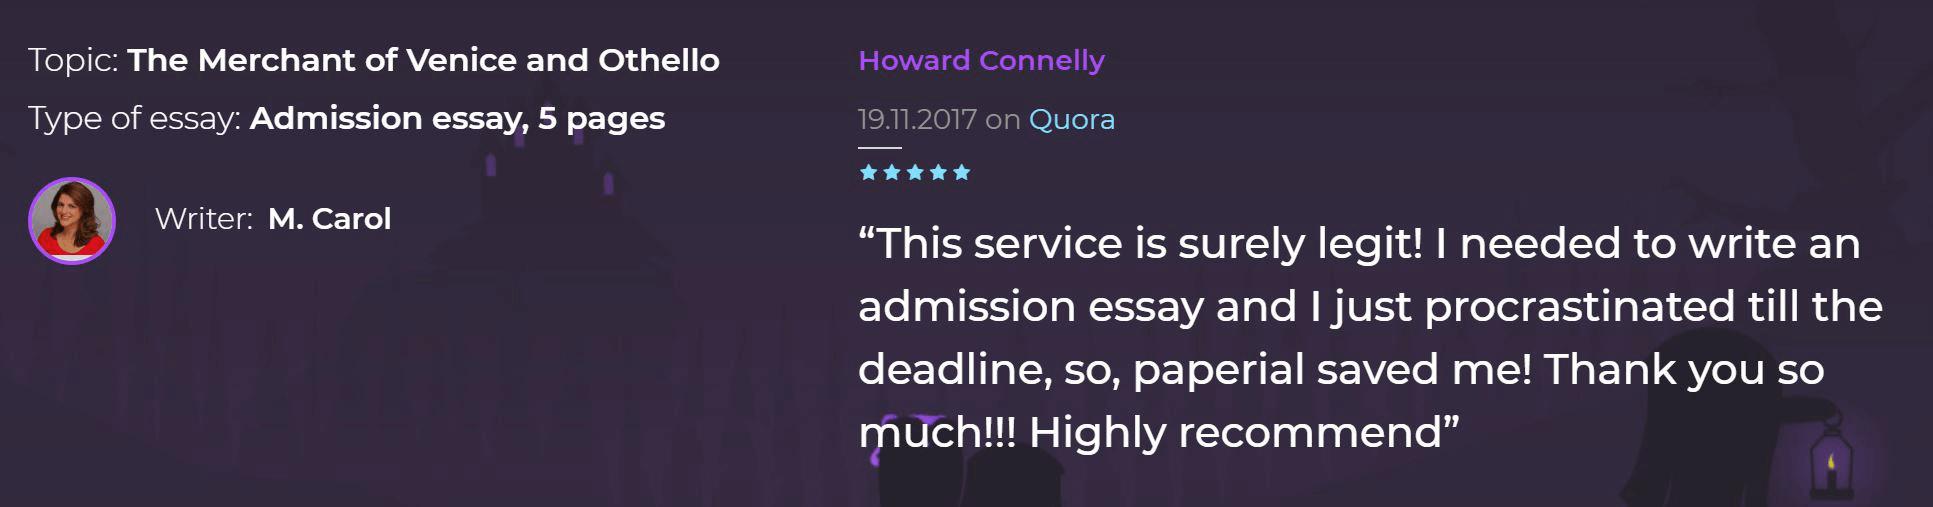 feedback paperial